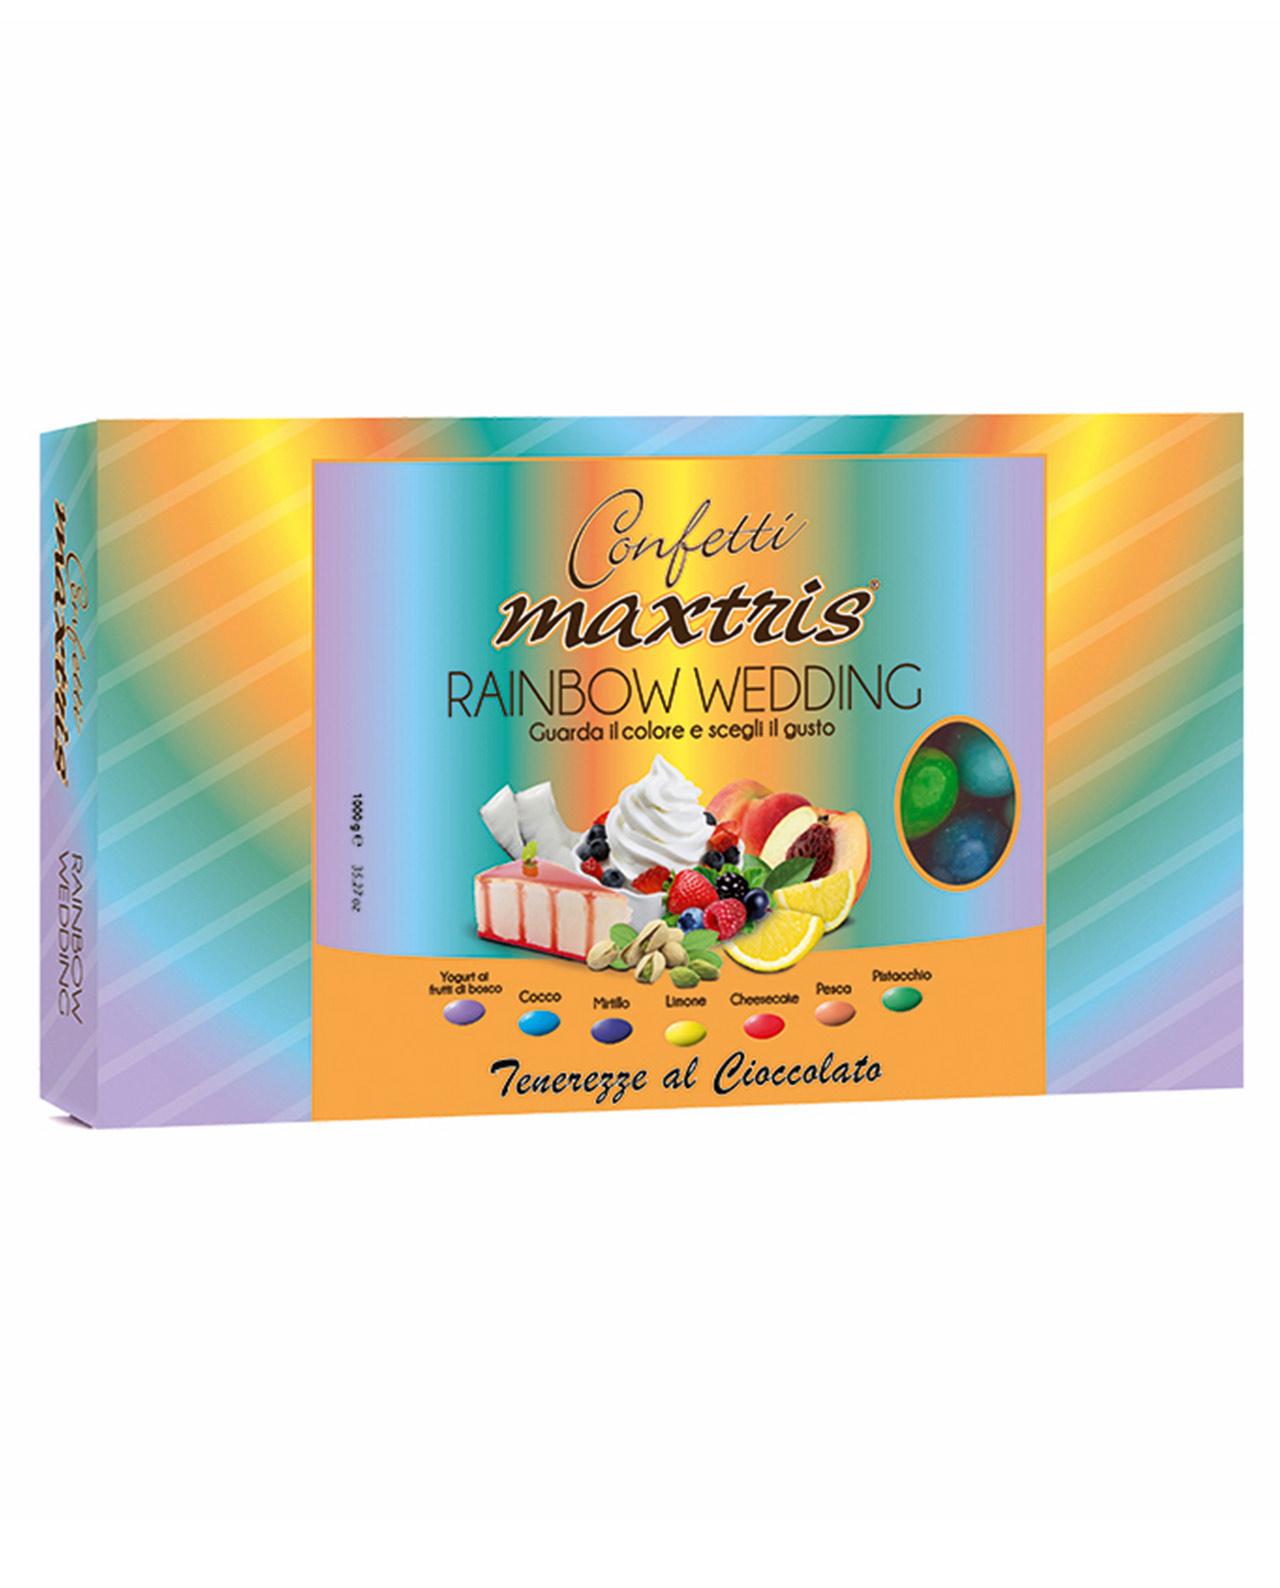 Confetti maxtris rainbow wedding mobilia store home for Mobilia wedding